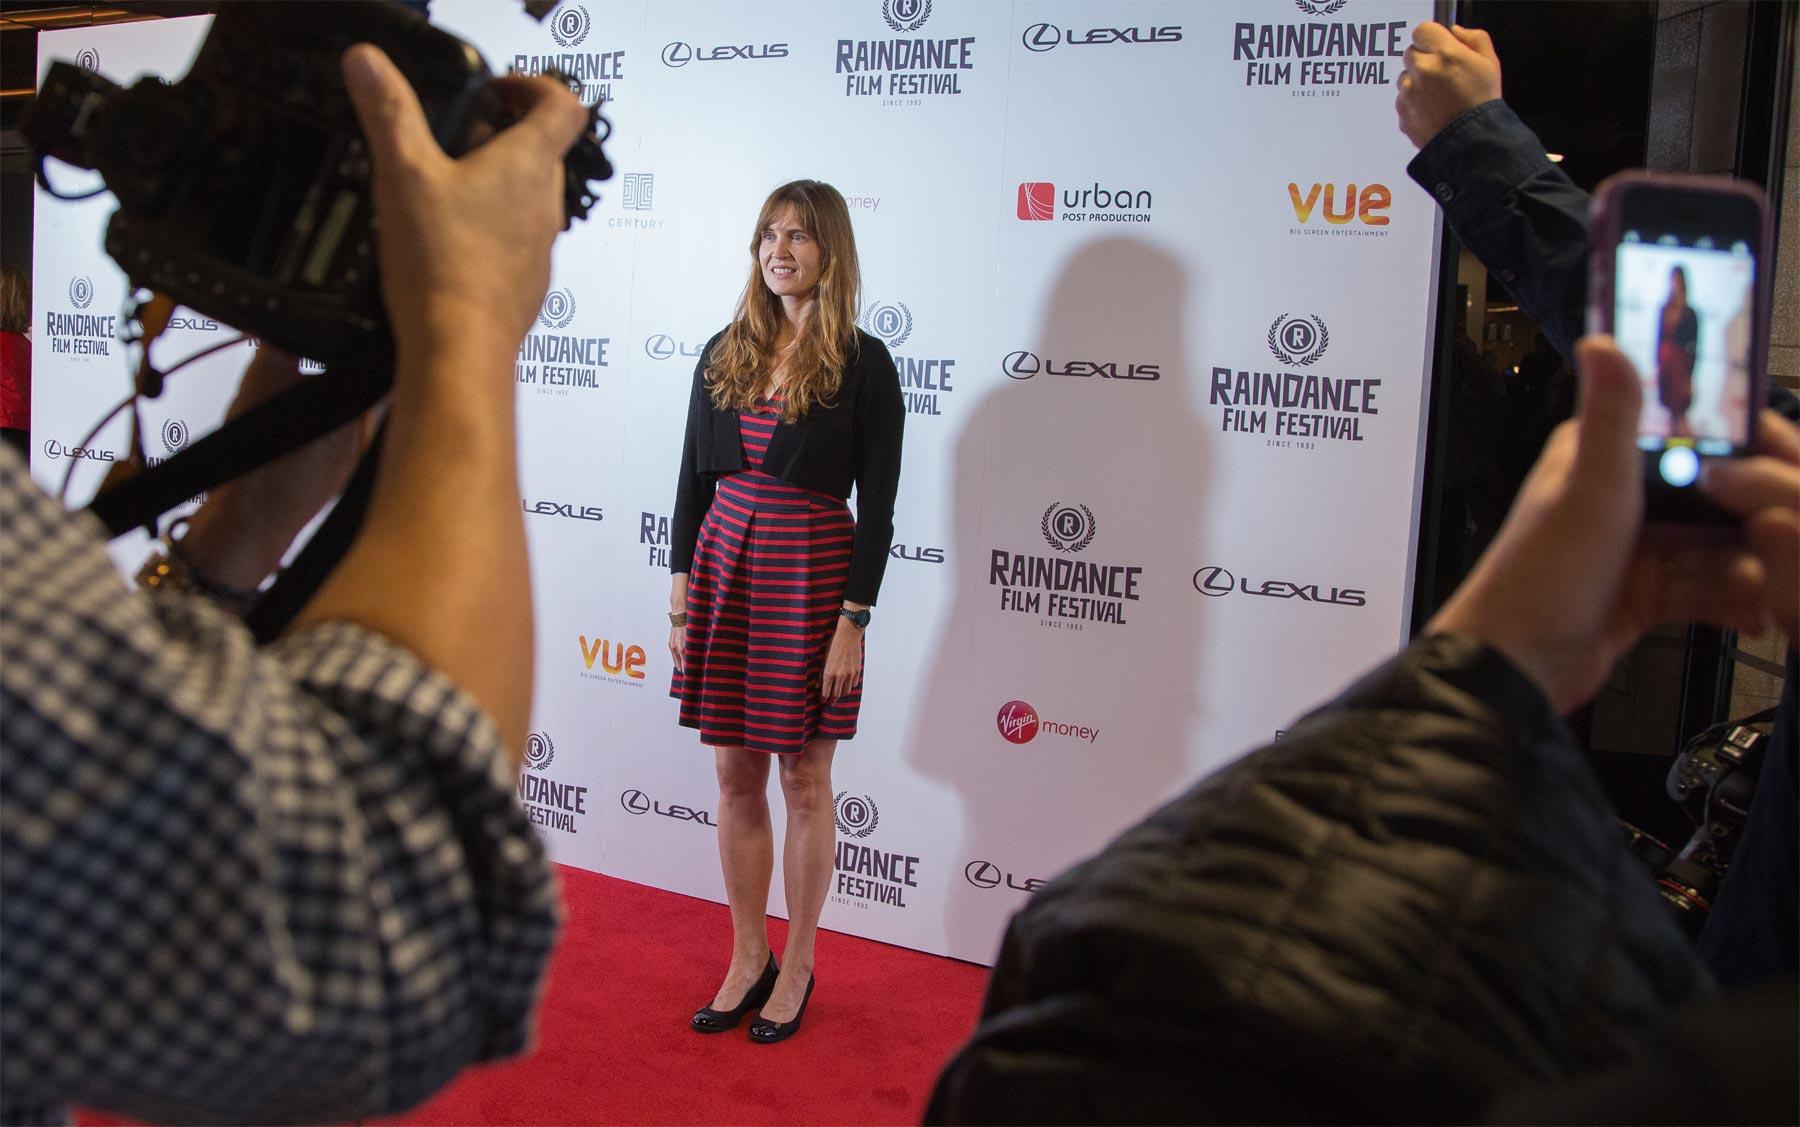 Luxurious Magazine InterviewWithAward-Winning Filmmaker Jeannie Donohoe 7